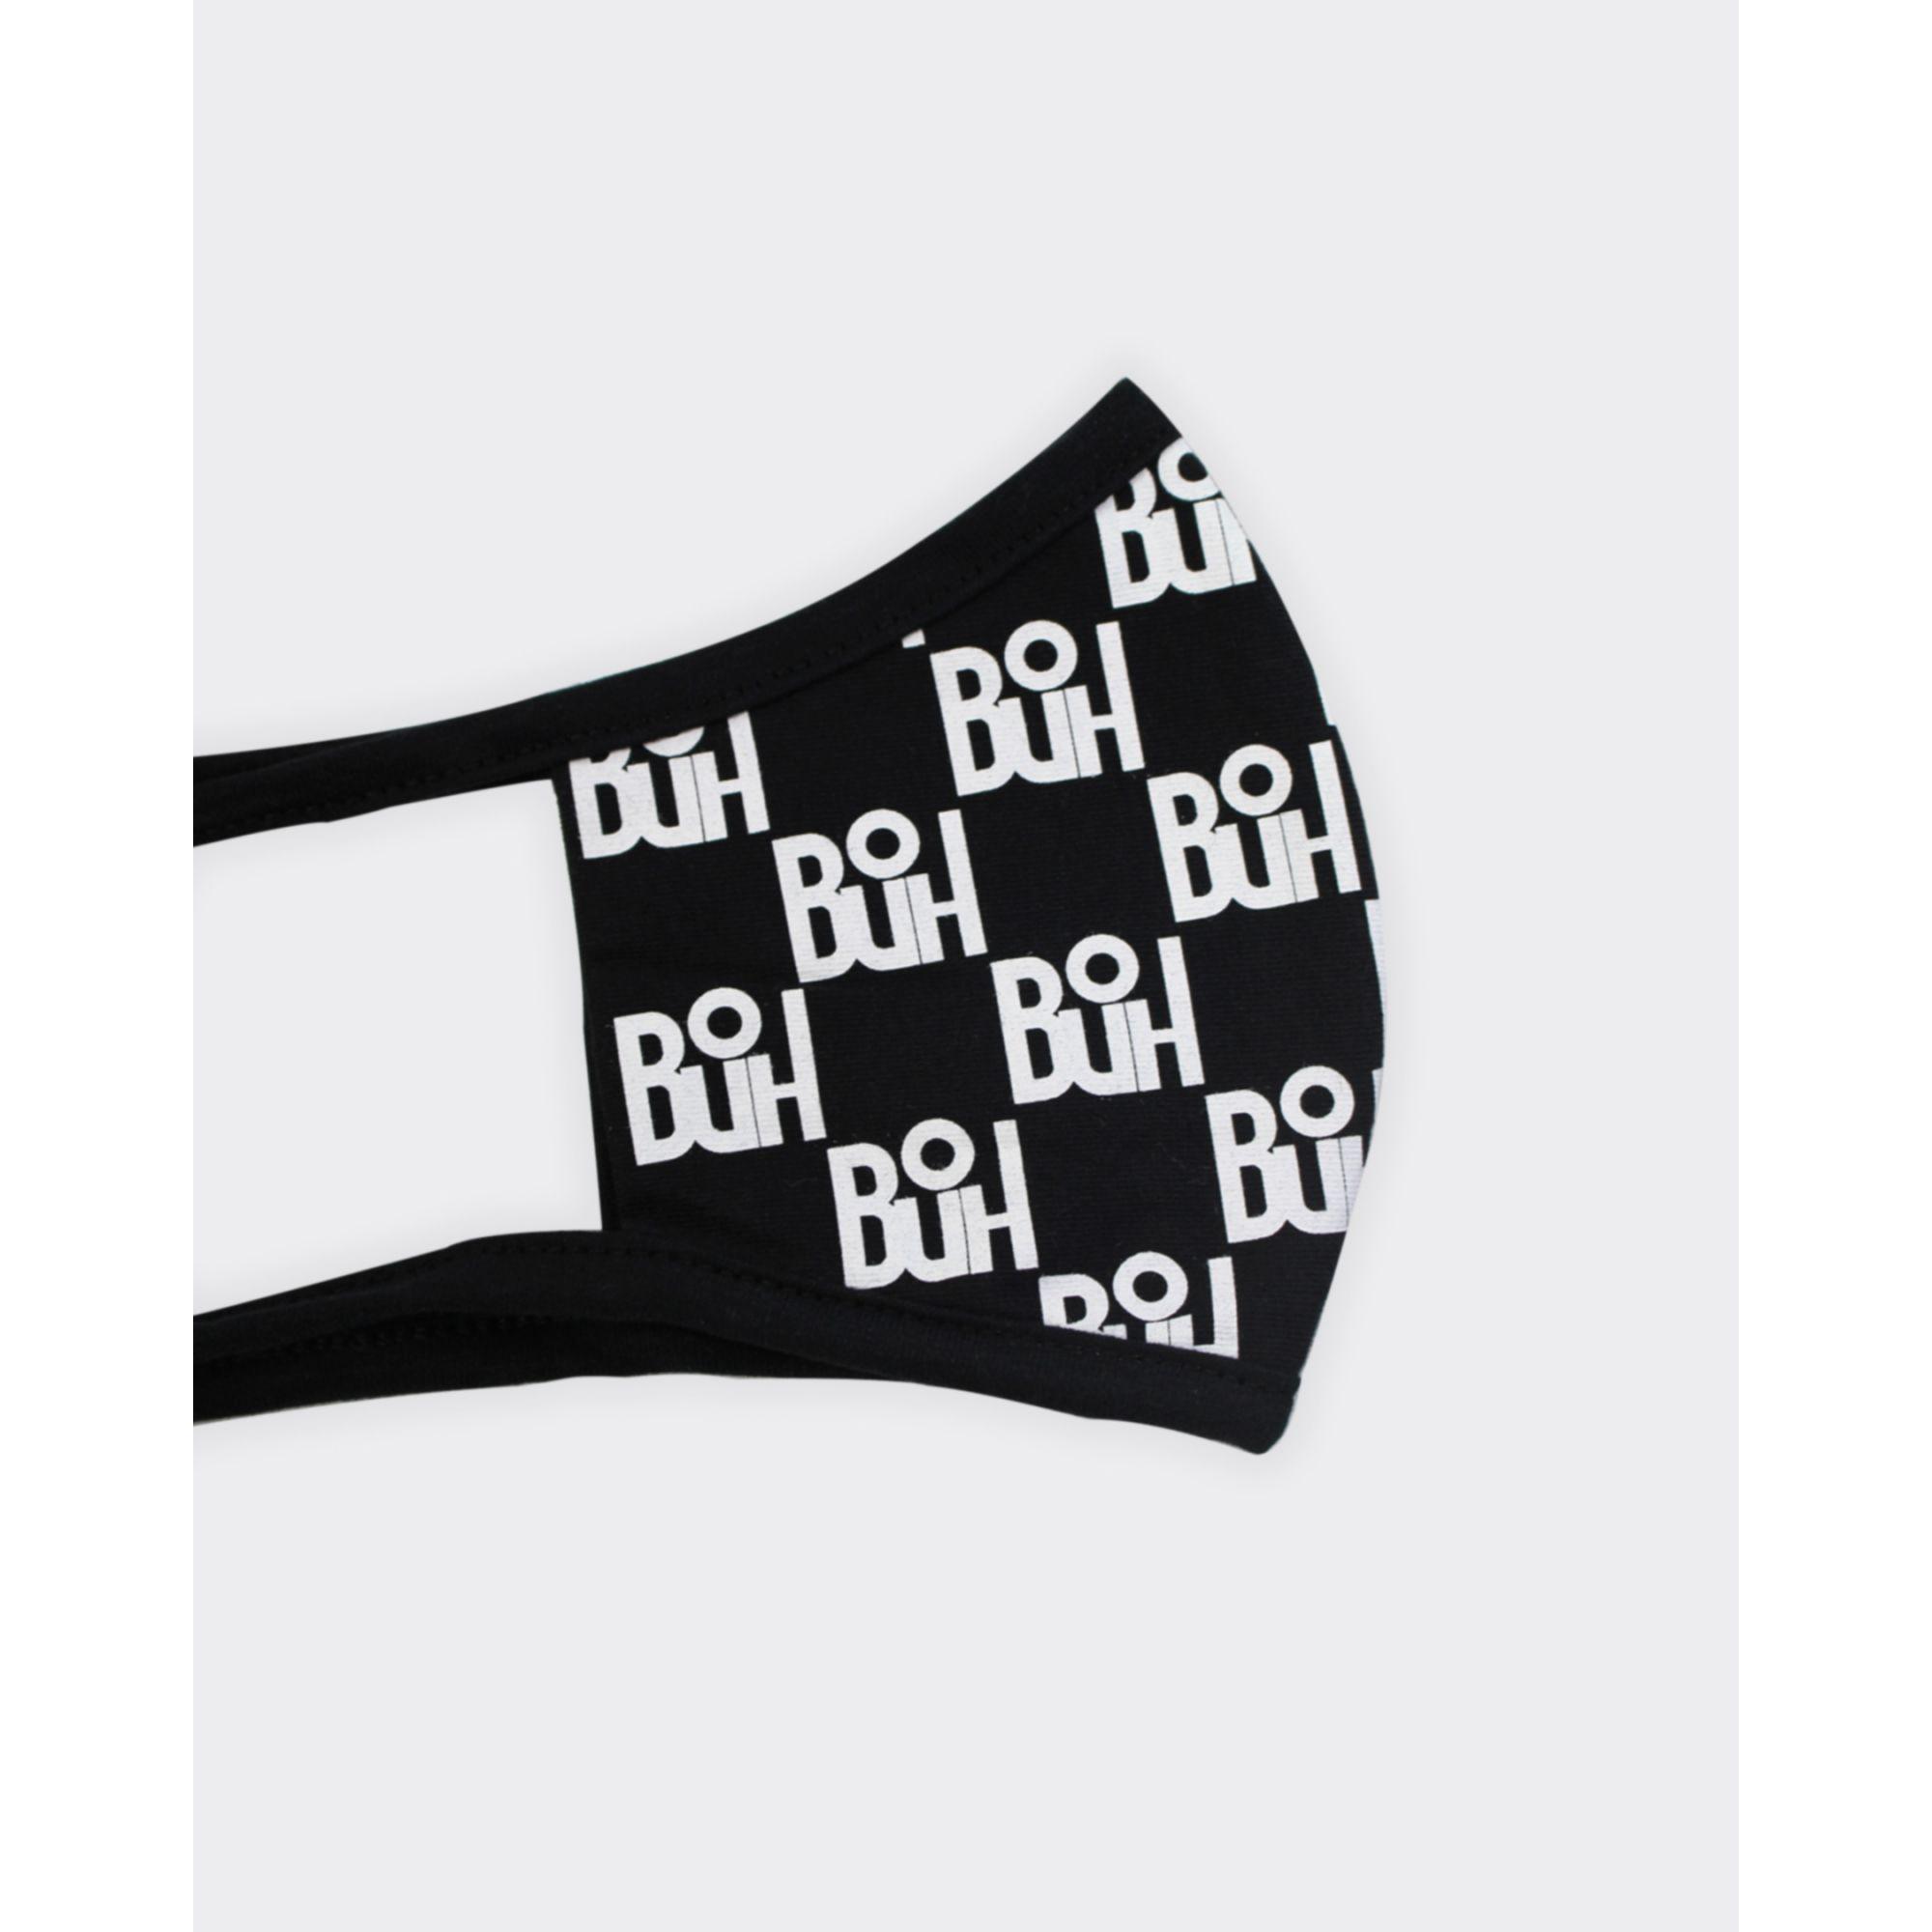 Máscara Buh Proteção Full Print Black & White